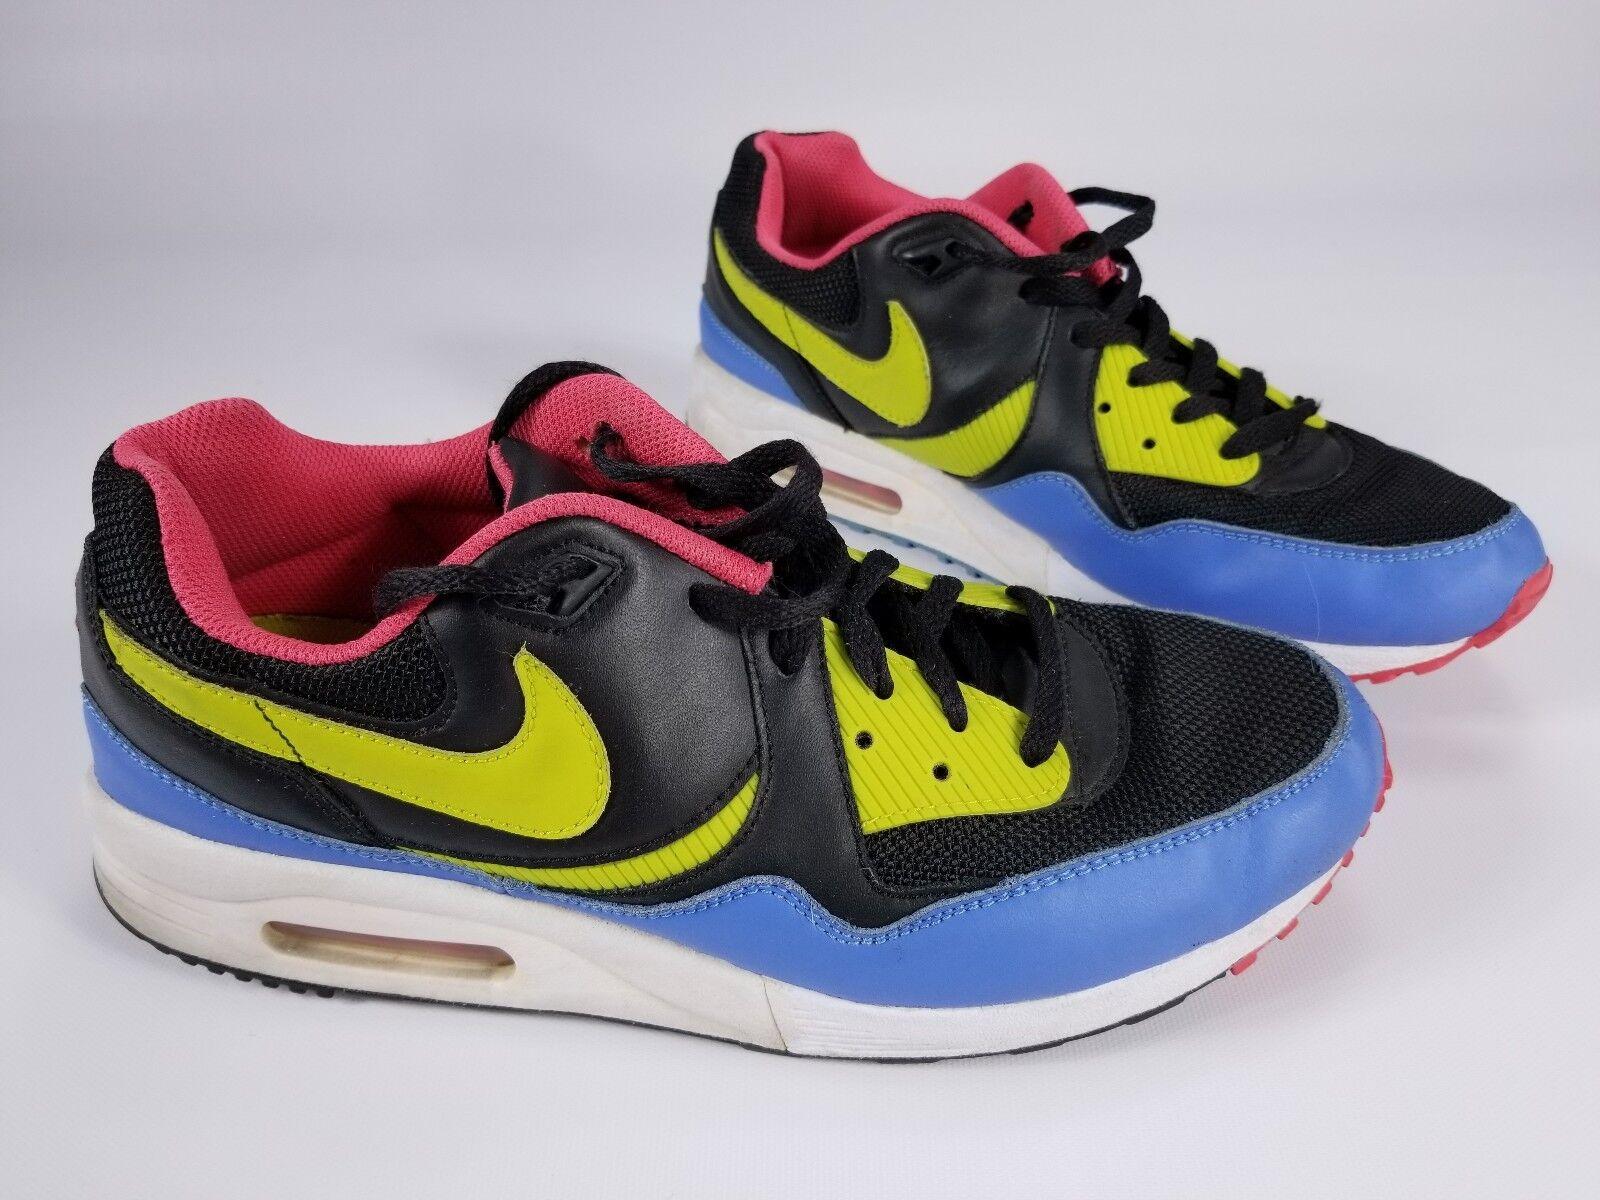 Nike mens air max light 2007 neon - swoosh mens Nike schuhe turnschuhe sz 10 nur selten e46162